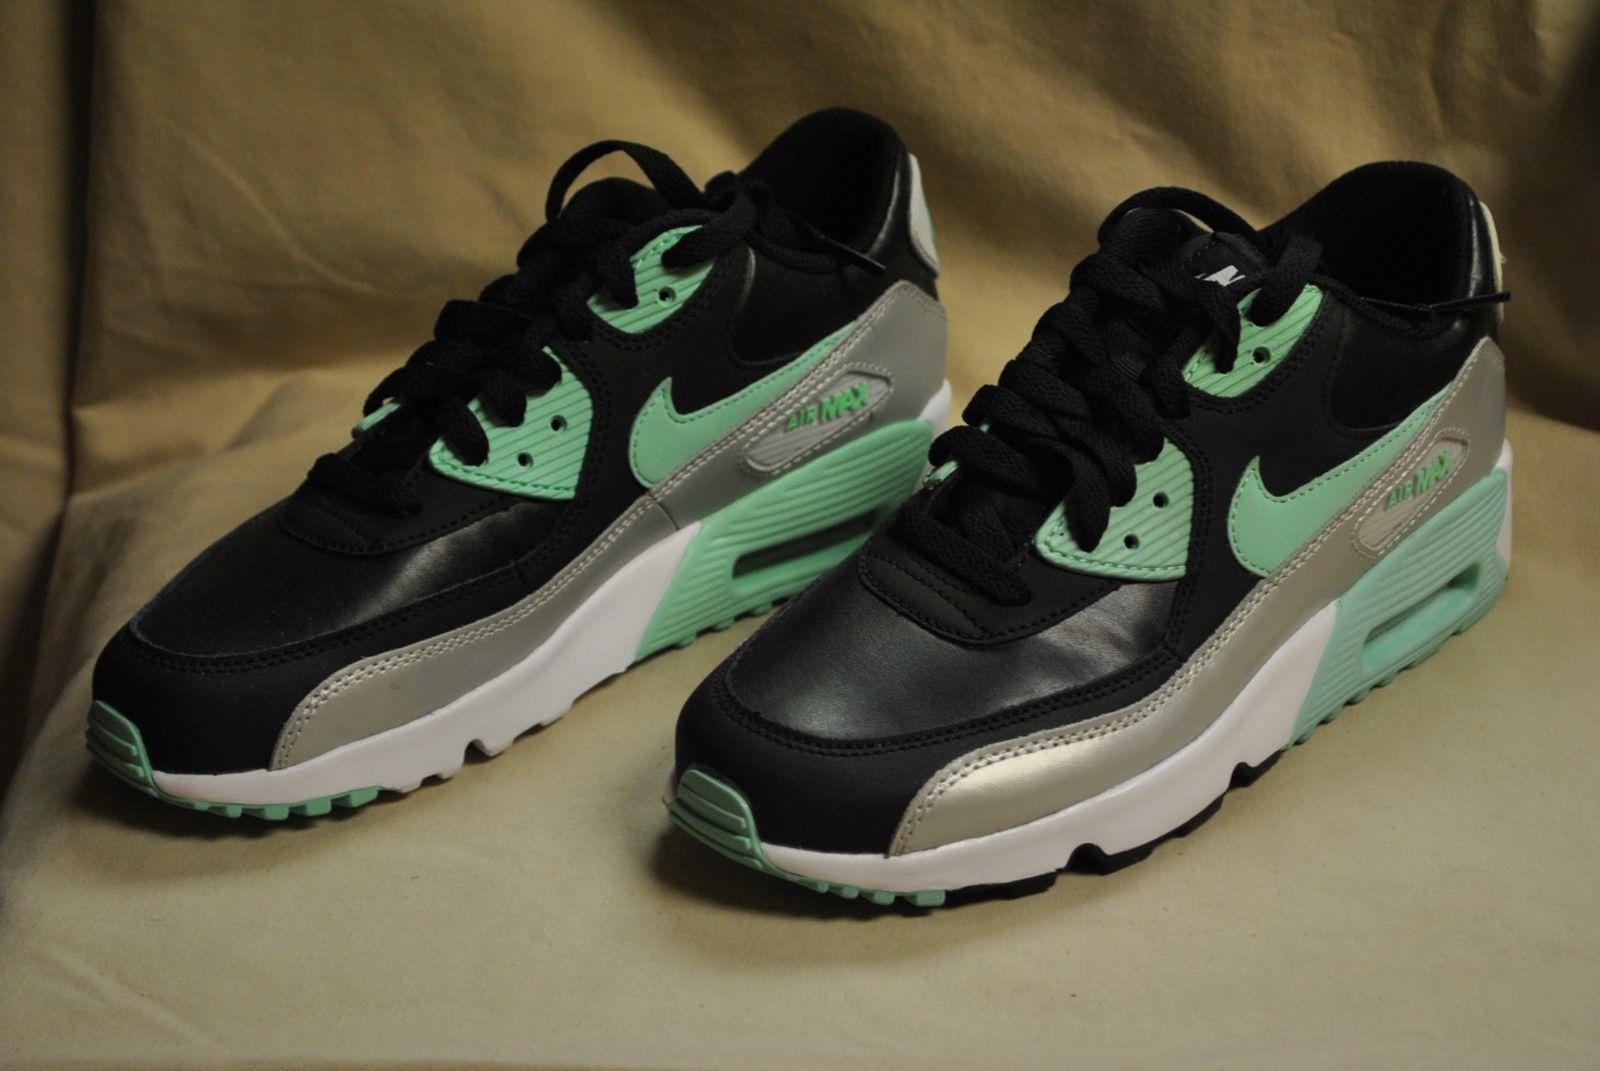 new arrivals 1da63 03ed0 Nike AIR MAX 90 LTR (GS)~ Black Grn-Pltnm~ and 25 similar items